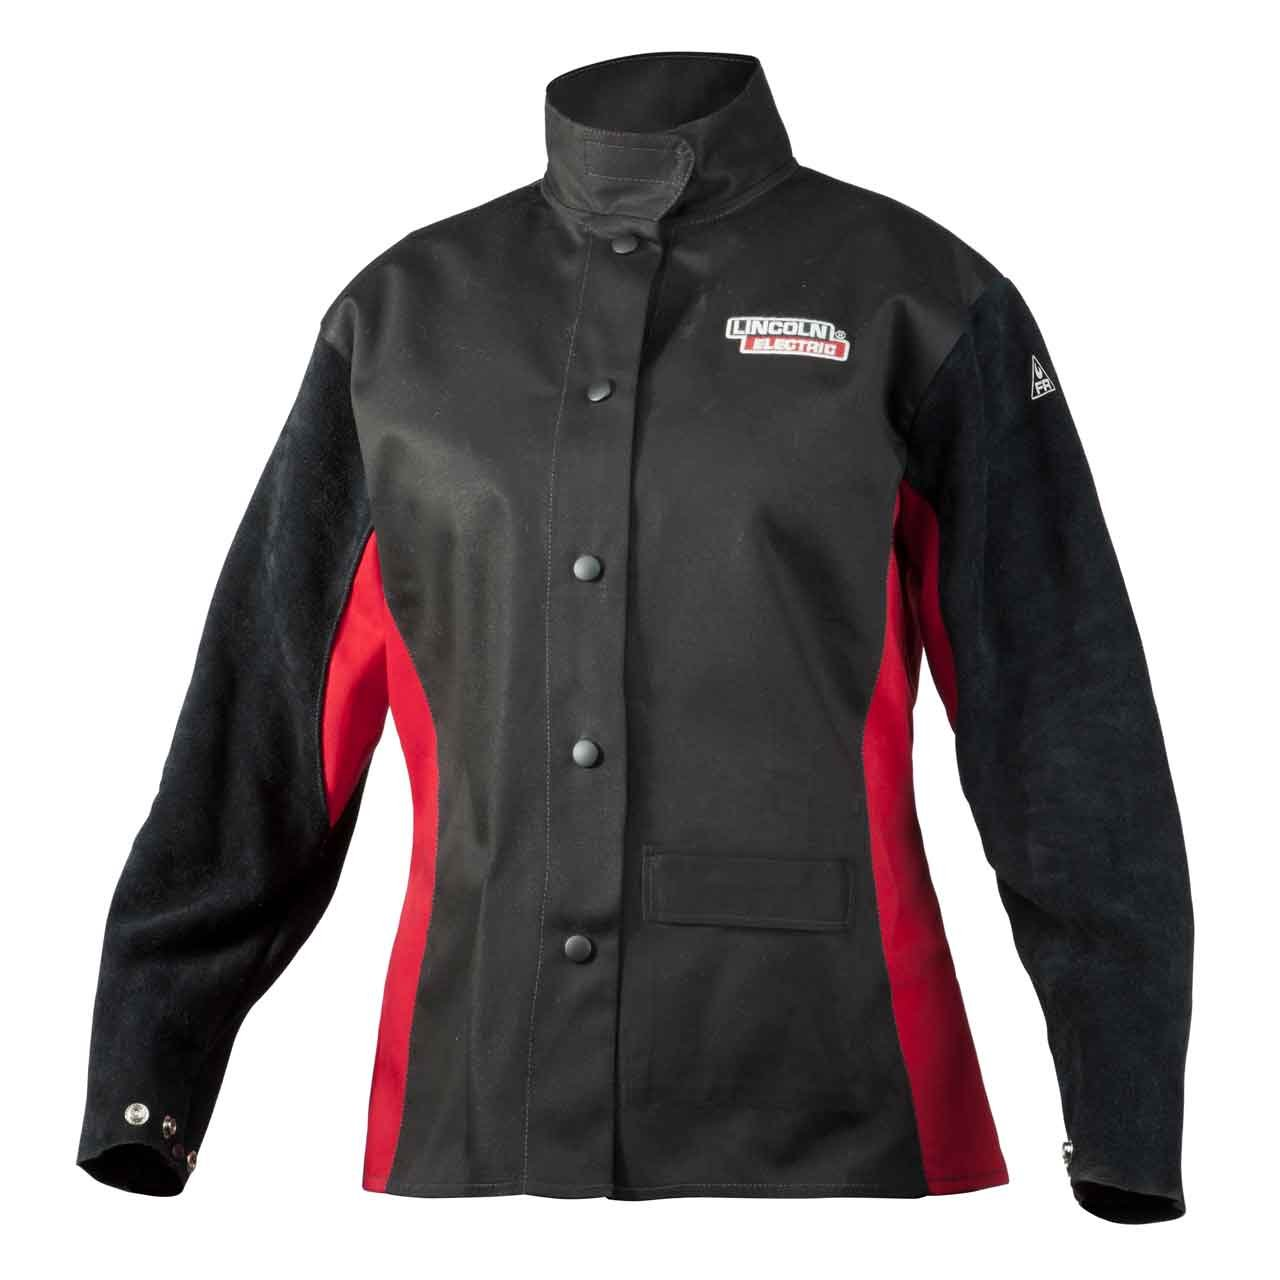 Lincoln Electric Women's Leather Sleeved Welding Jacket | Women's XS | K3114-XS